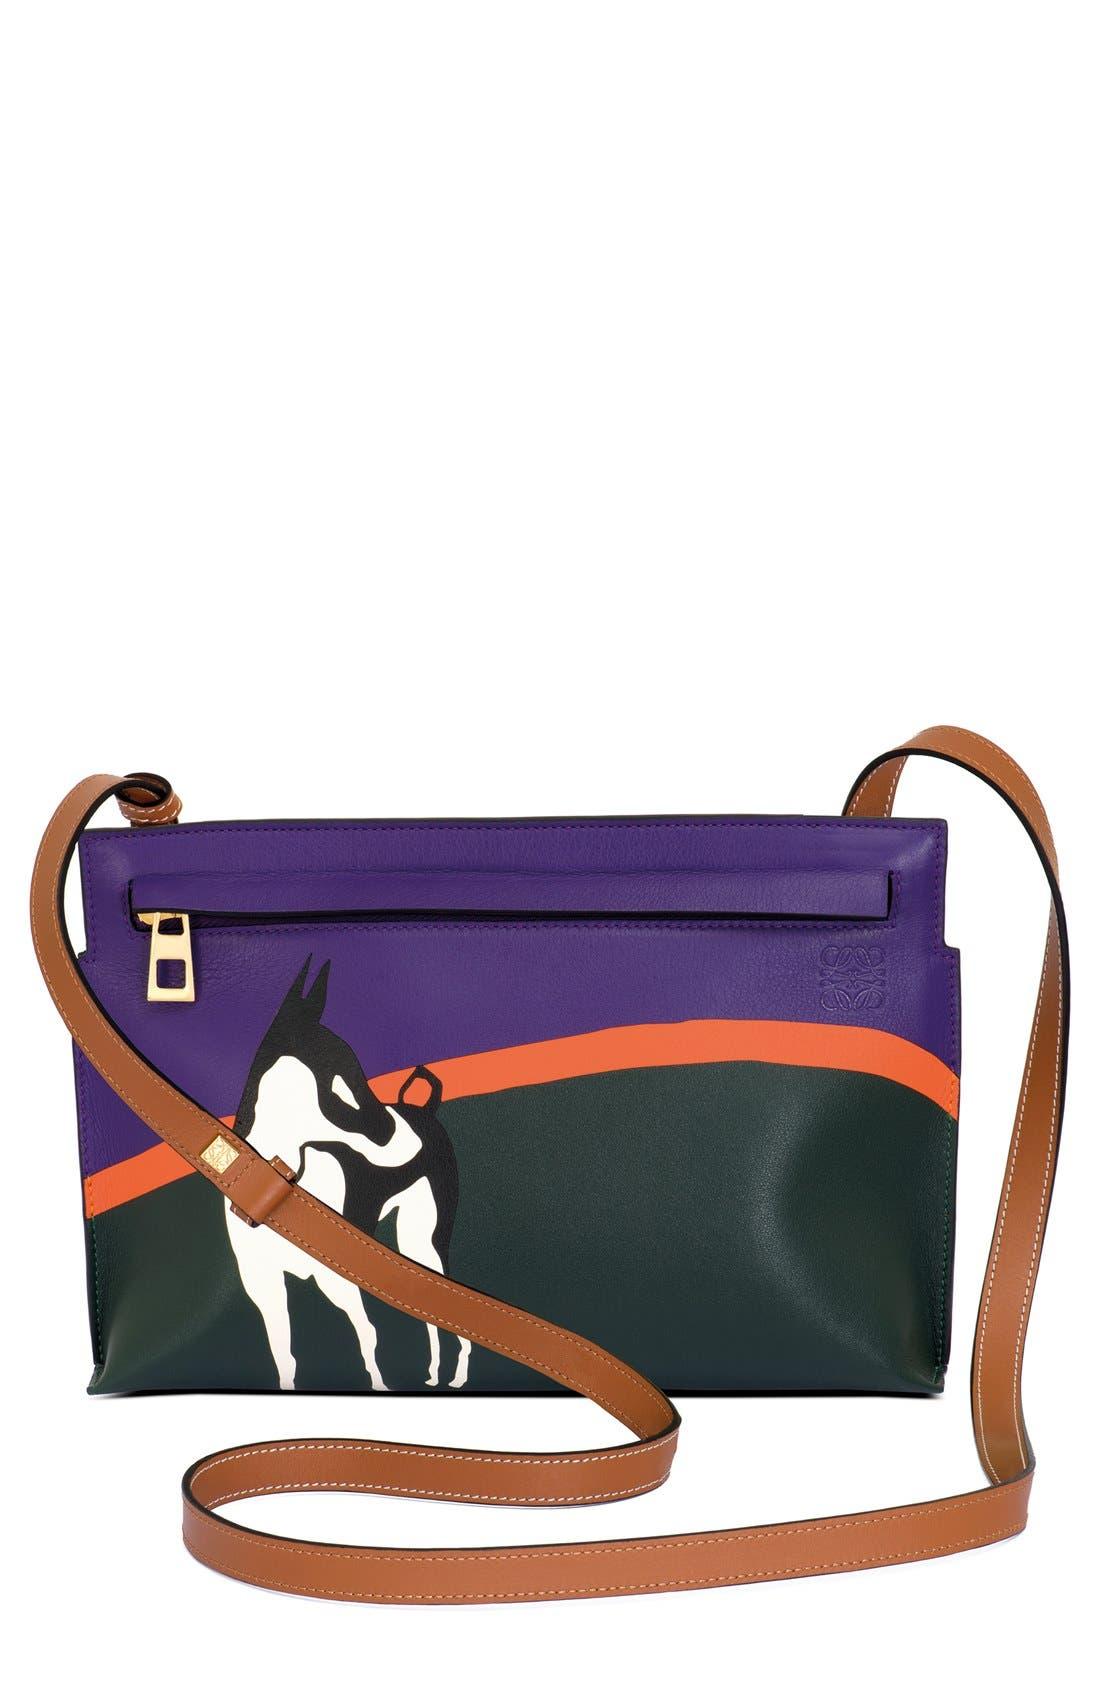 Main Image - Loewe 'Lost Dog - Medium T' Calfskin Leather Crossbody Pouch